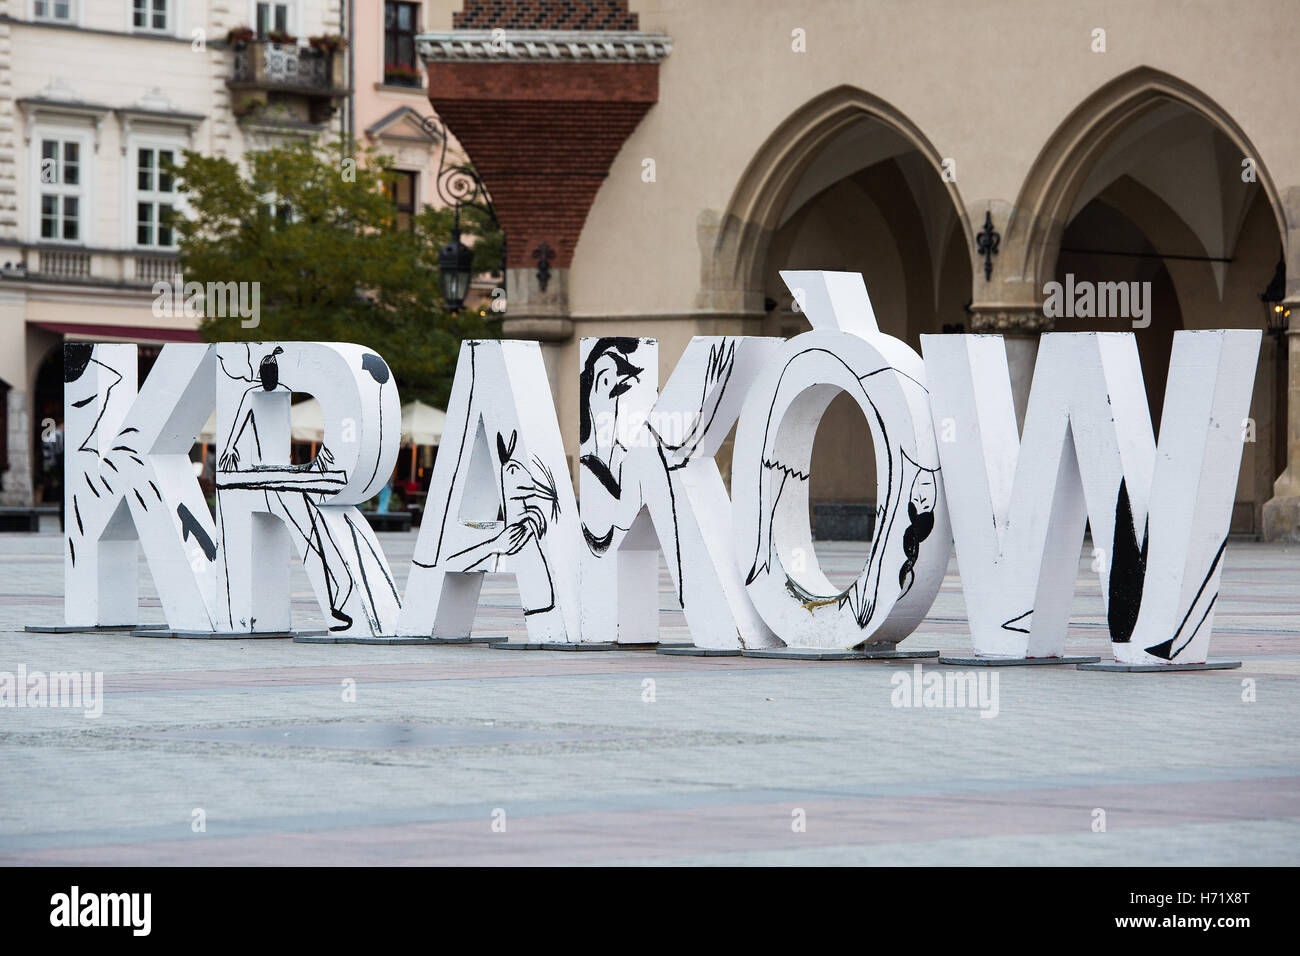 Krakow, Poland - October 27, 2016: Krakow sign in large white capital letters on Rynek Glowny, the old city market - Stock Image